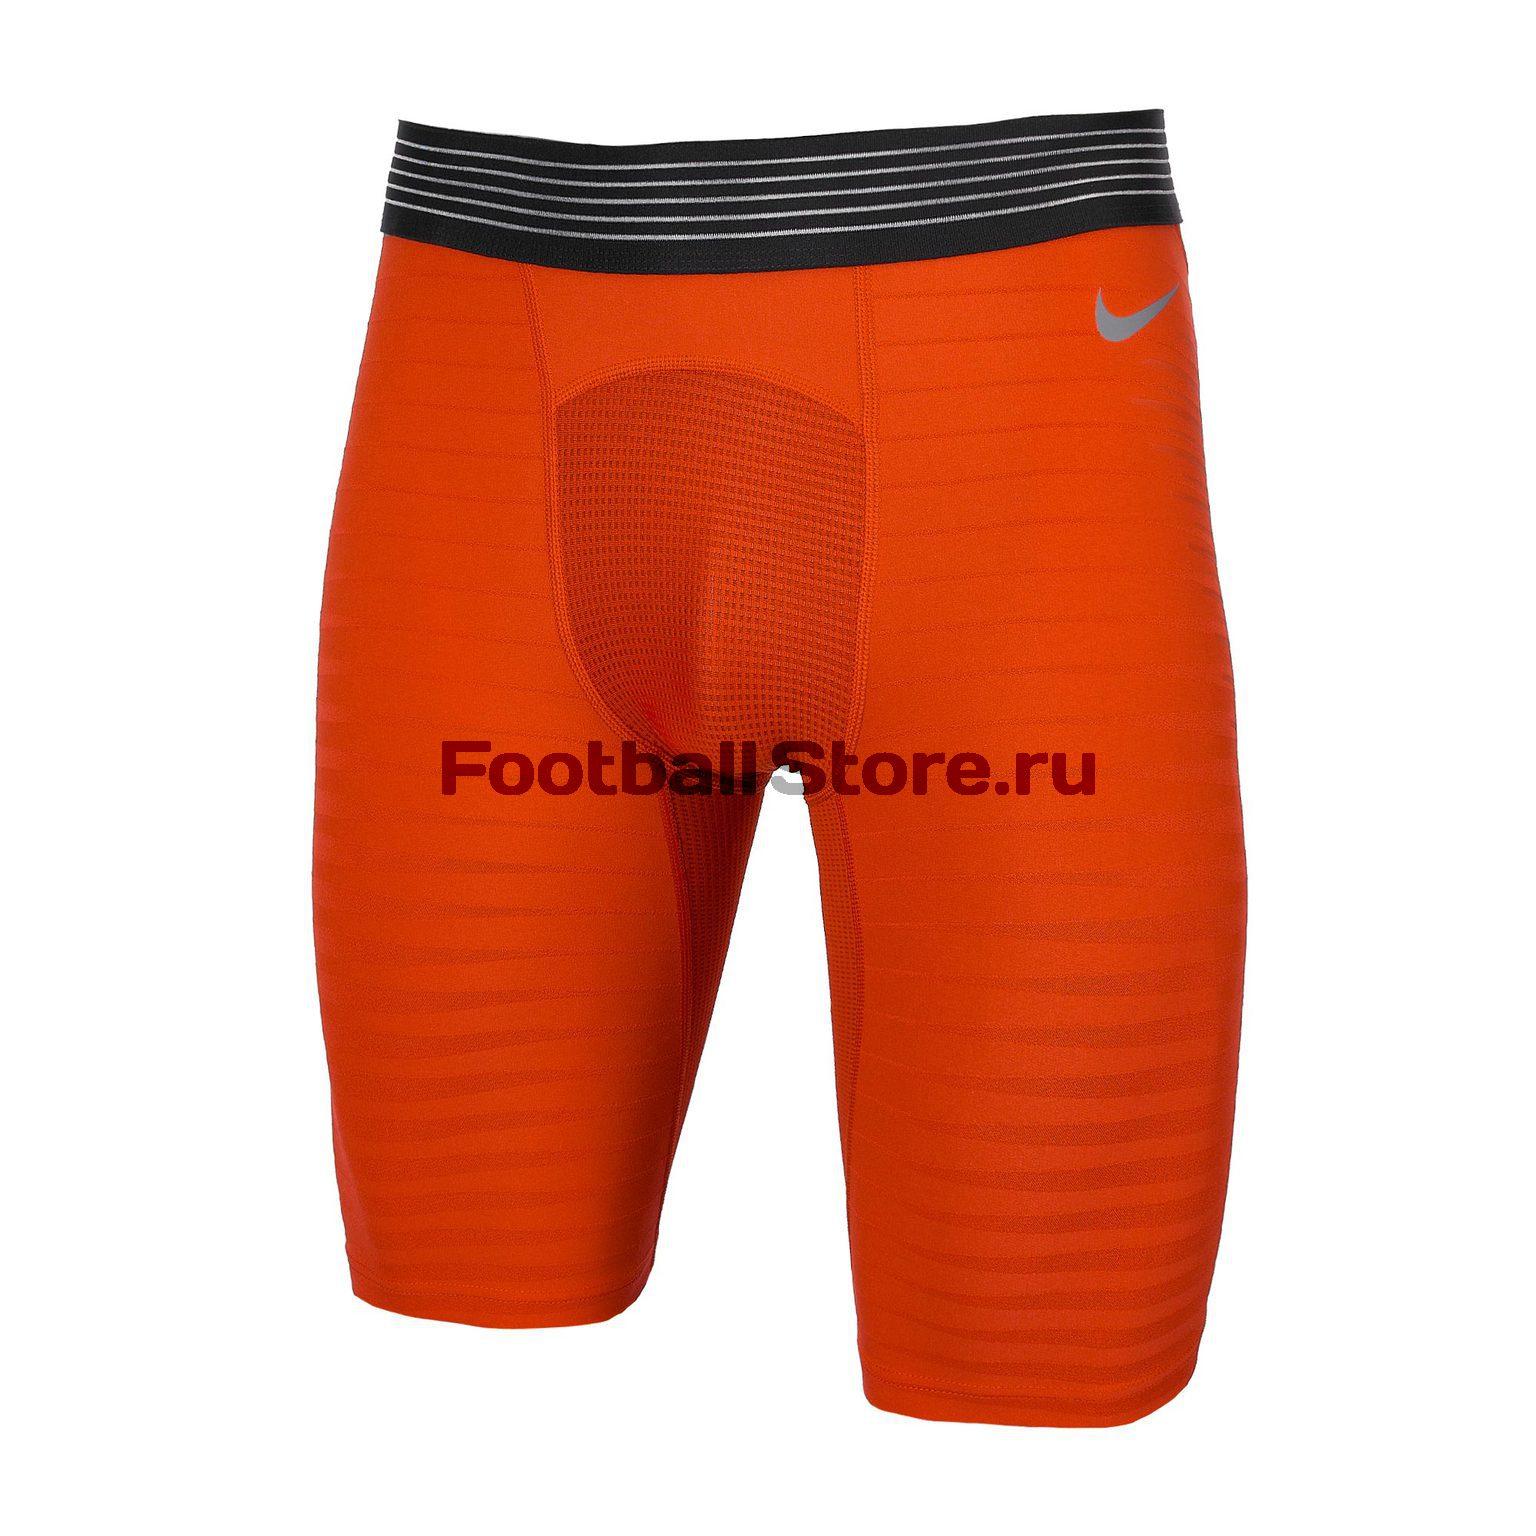 Белье шорты Nike GFA Slider 923085-657 куртка спортивная nike guild 550 jacket 693529 657